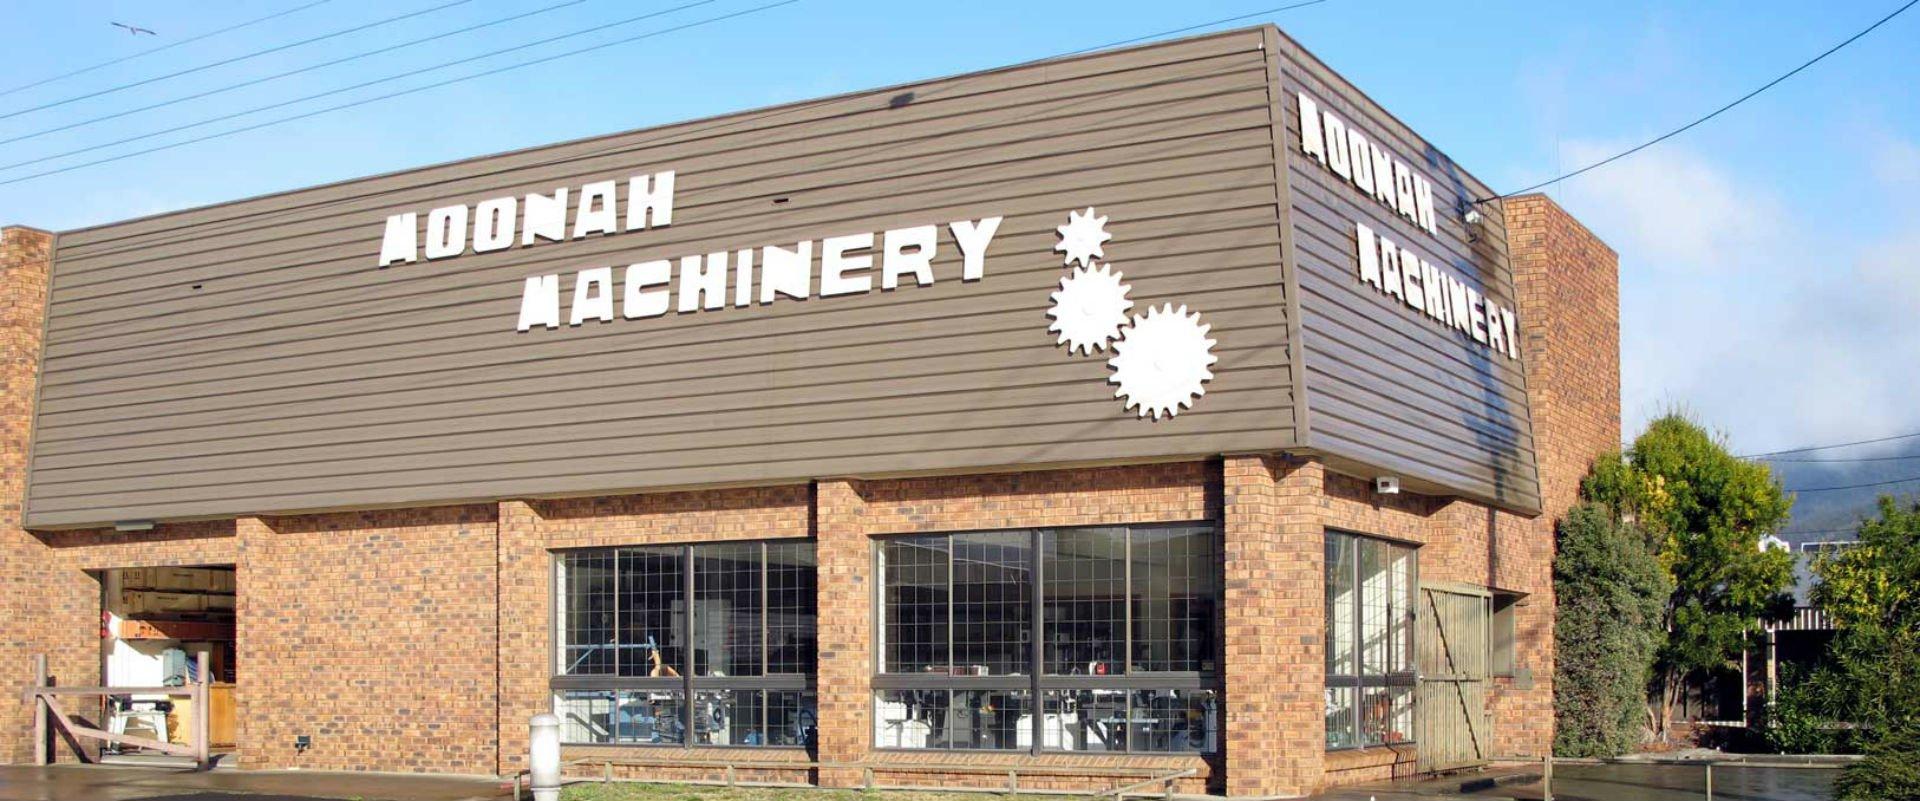 Moonah Machinery - Moonah Tasmania